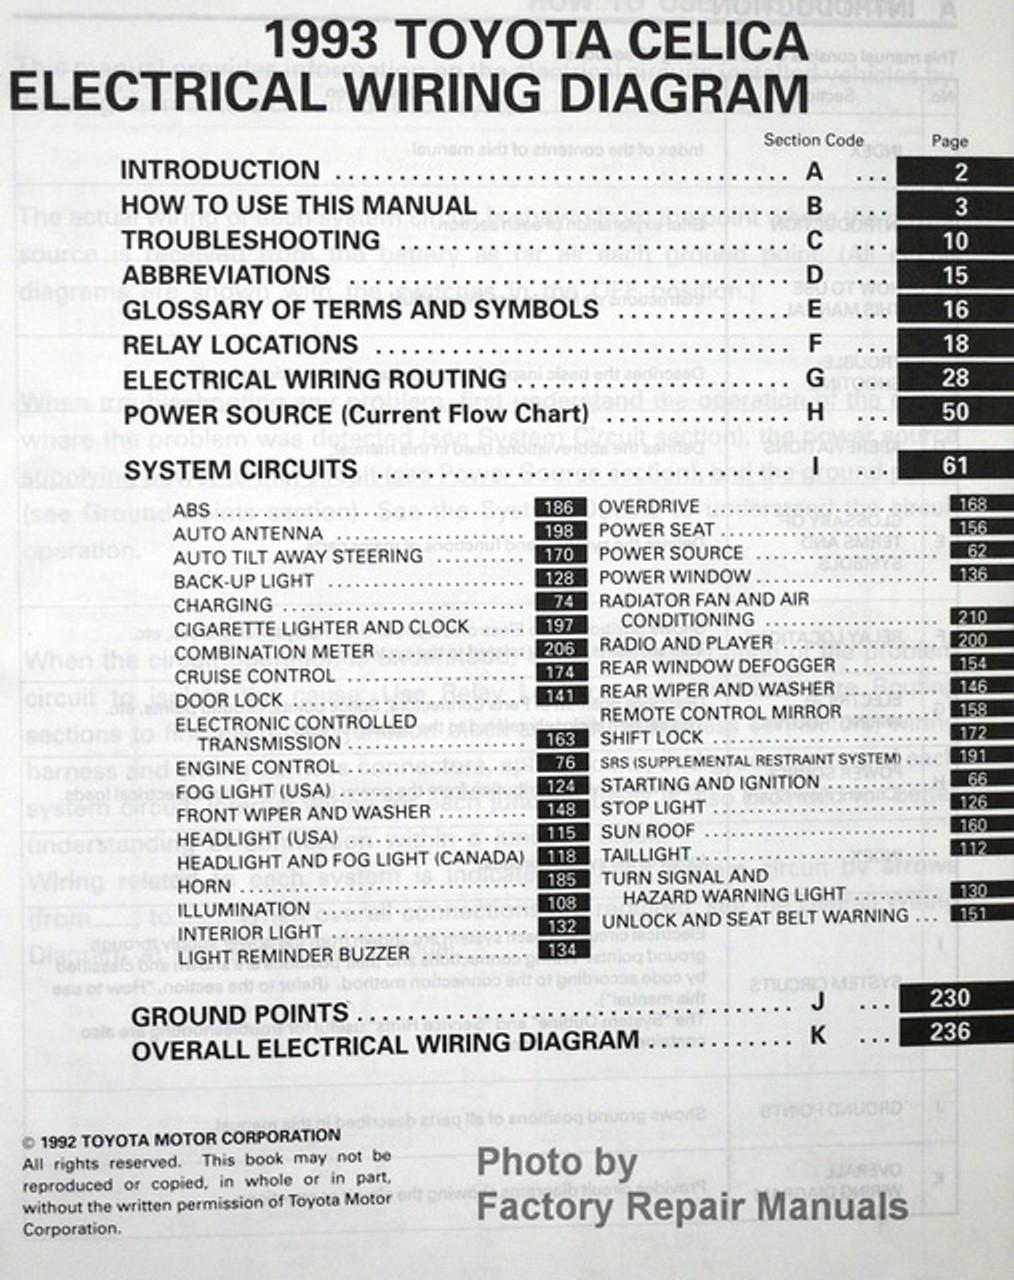 1993 Toyota Celica Electrical Wiring Diagrams - Original Shop Manual